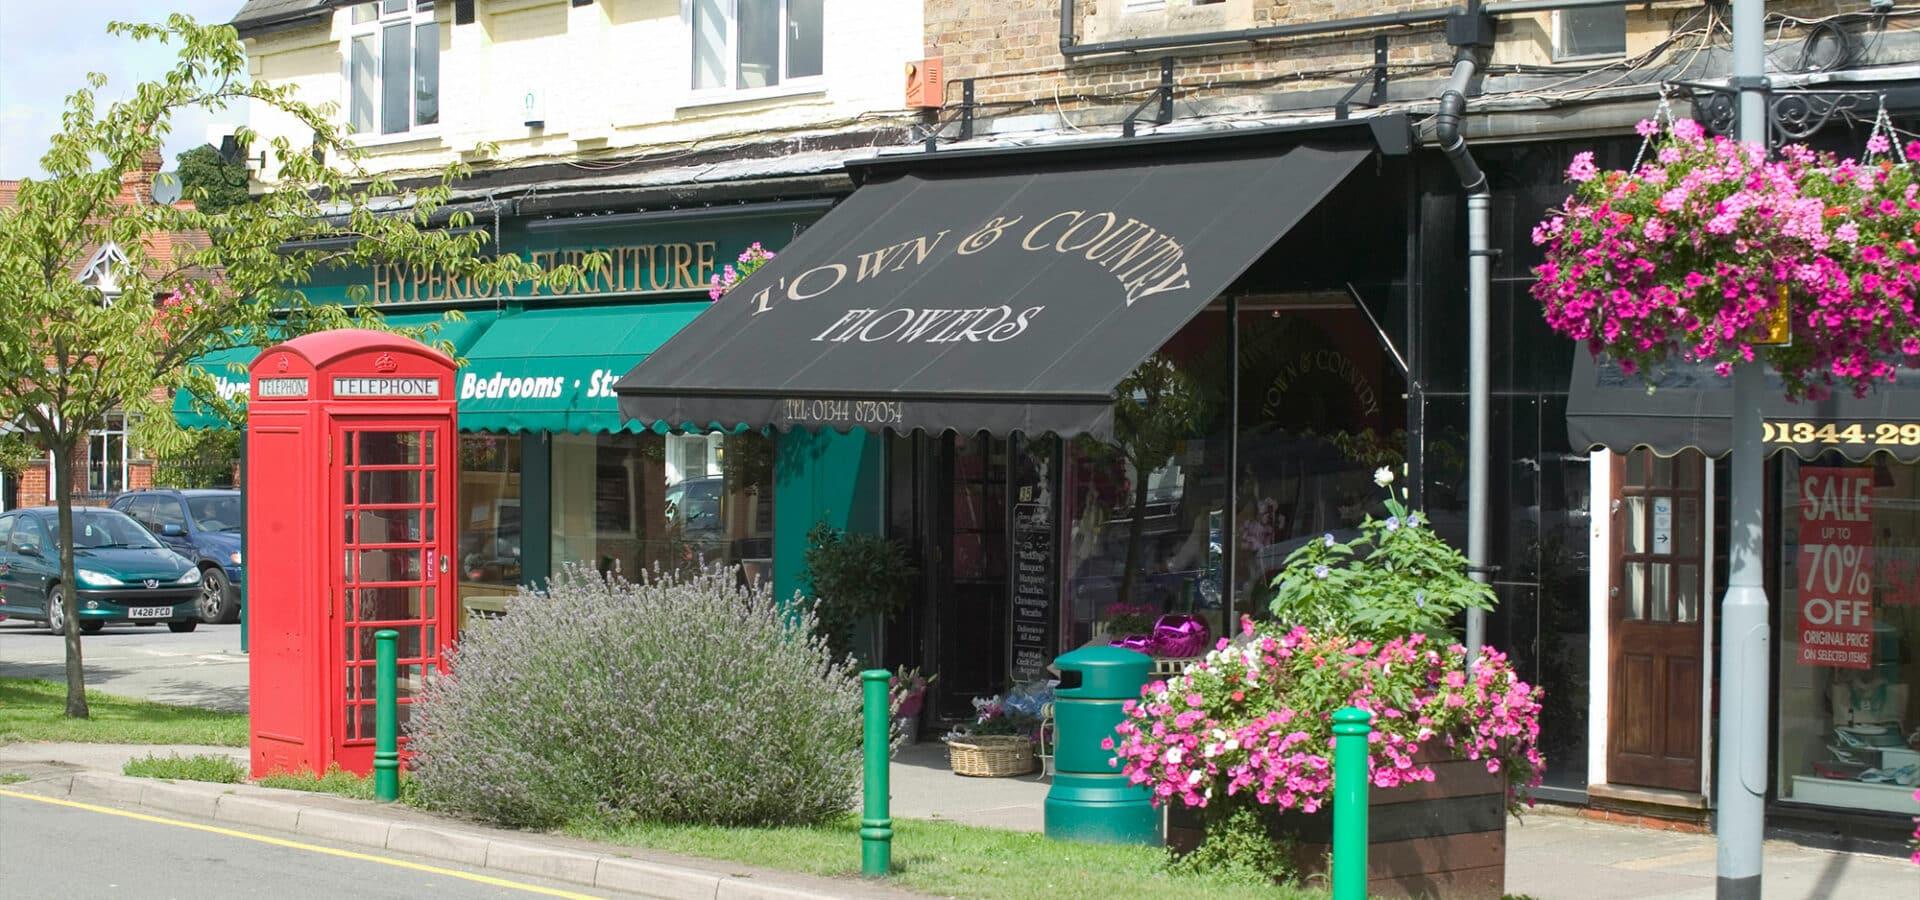 Local area image